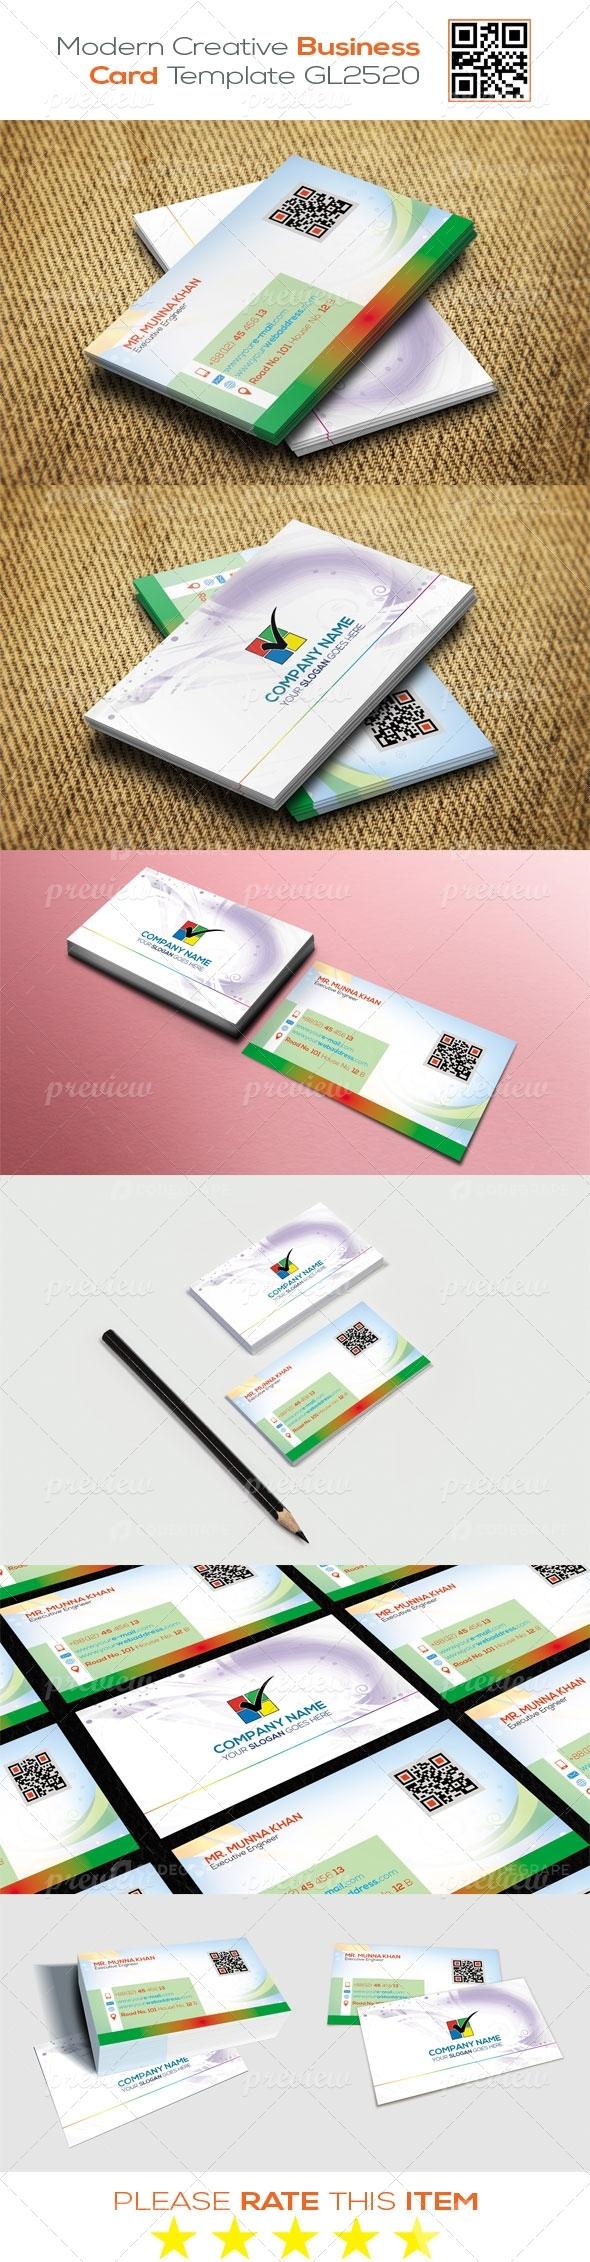 Modern Creative Business Card Template GL2520